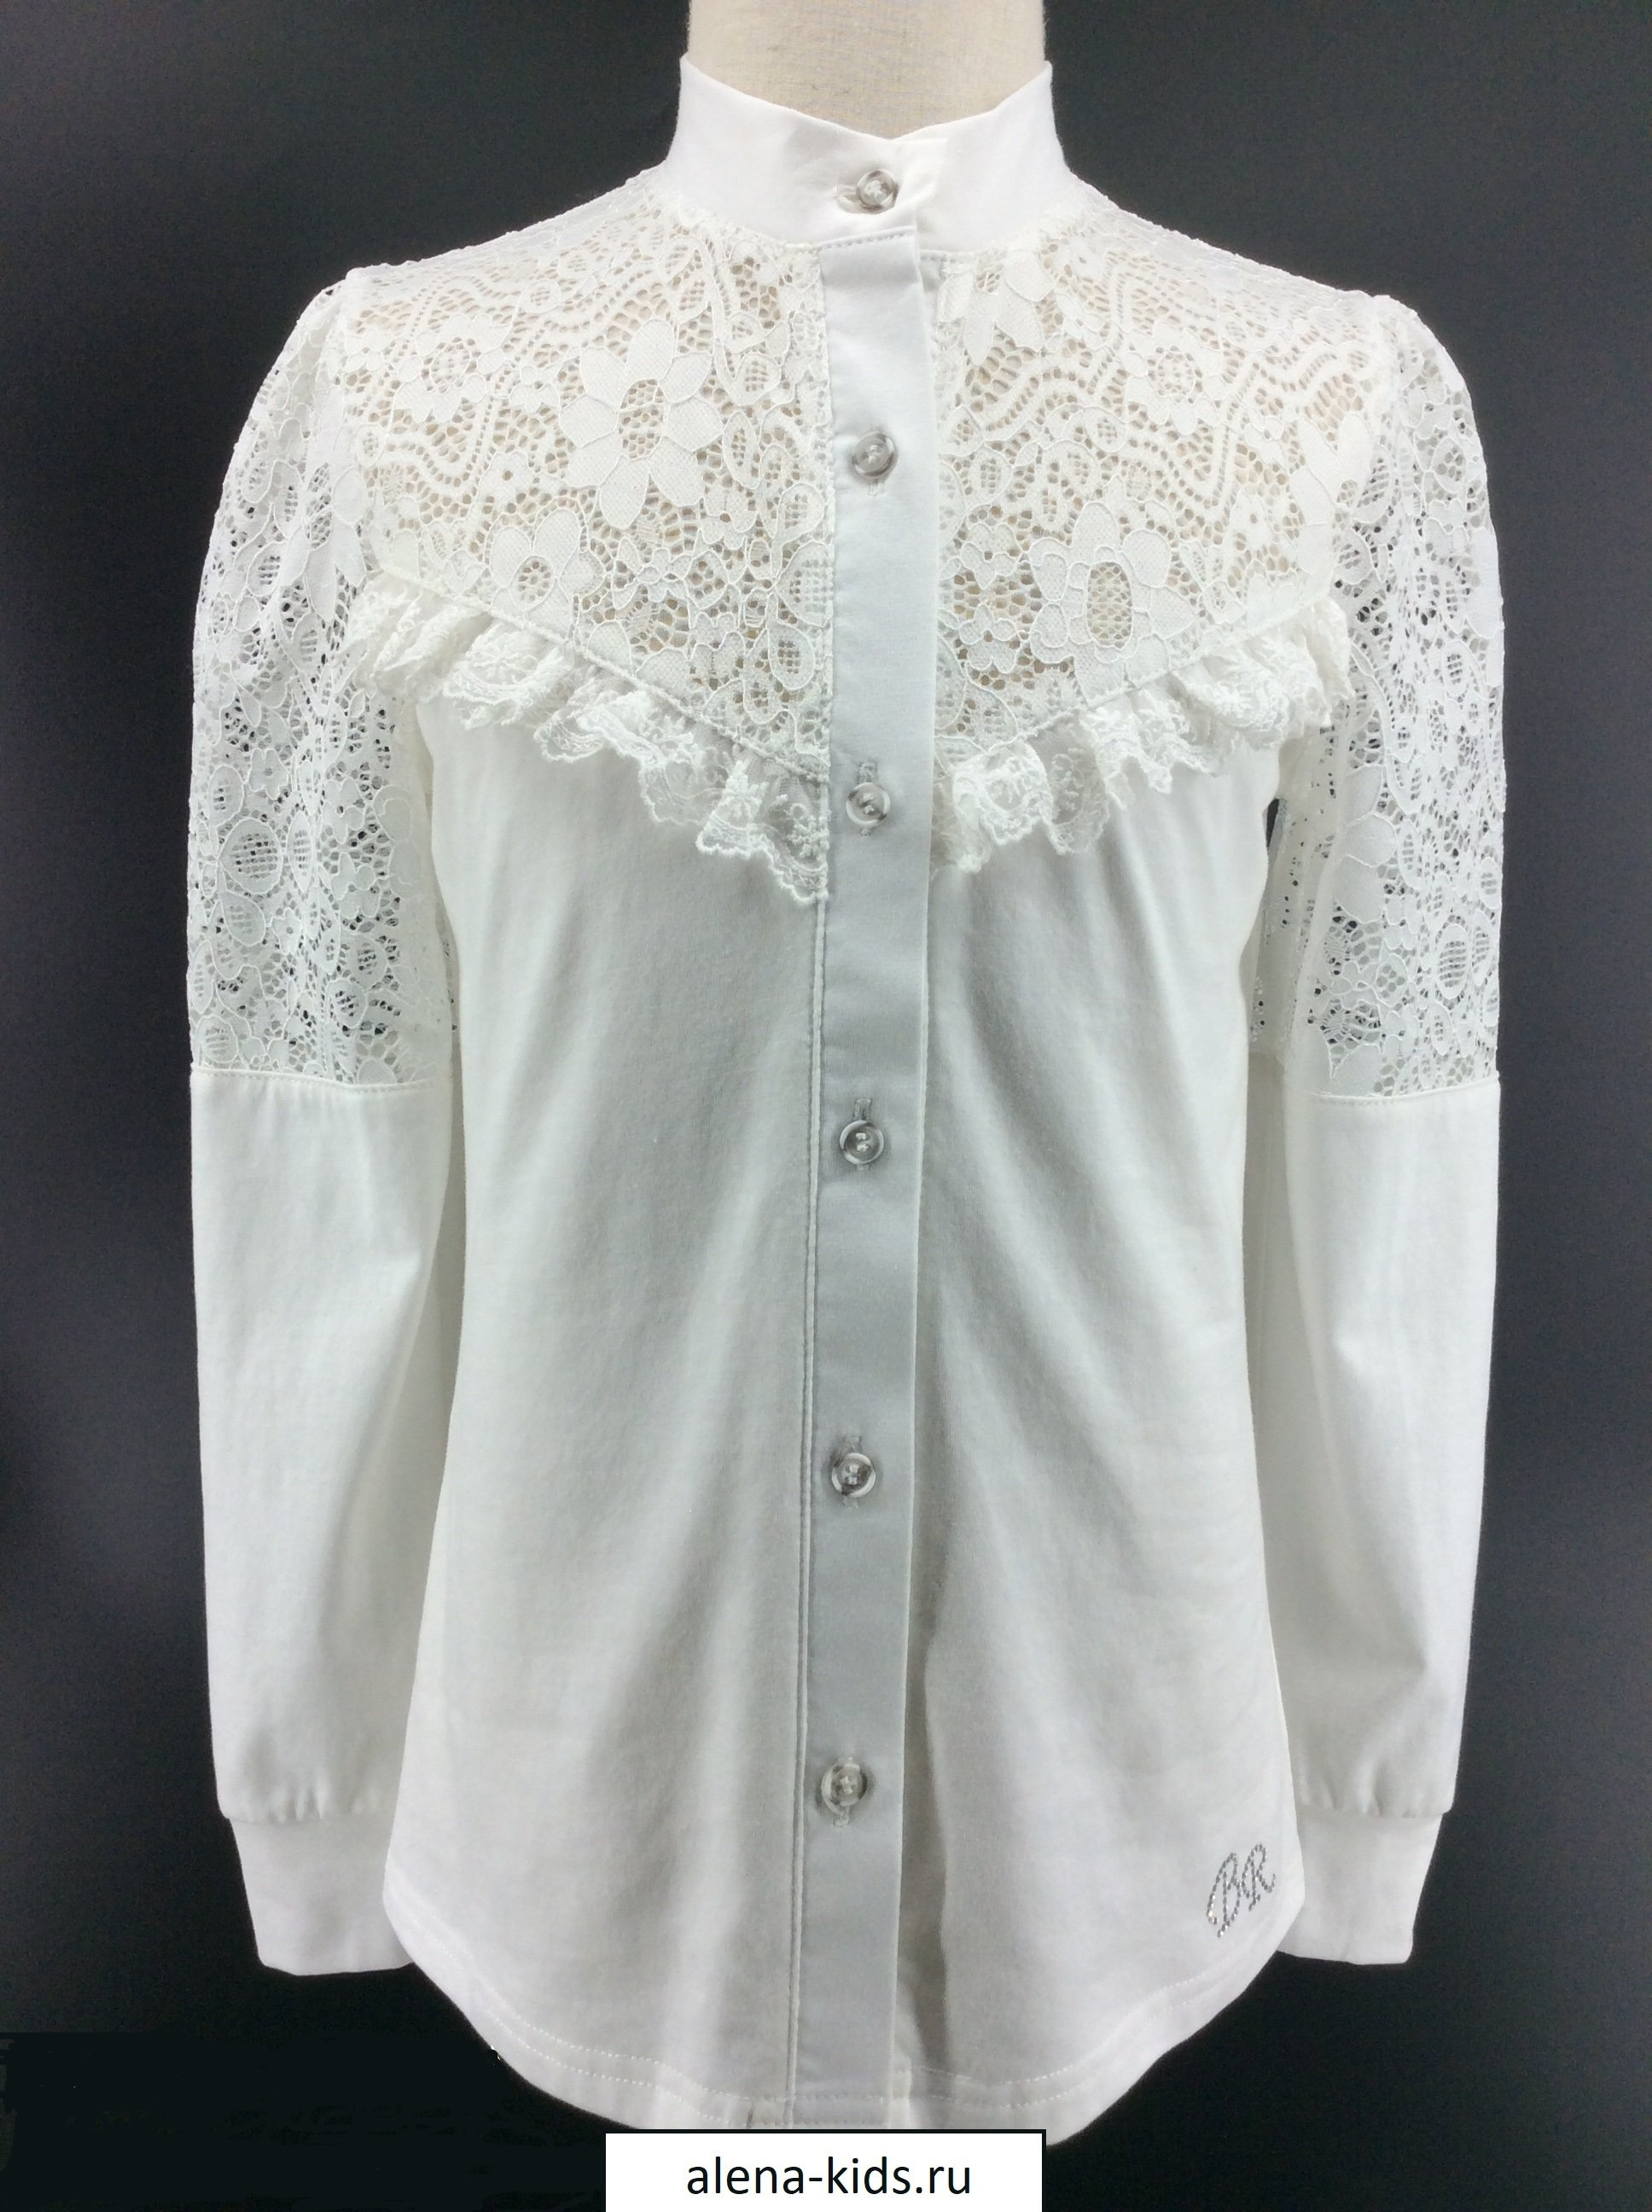 Блузка для девочки YGBH561364